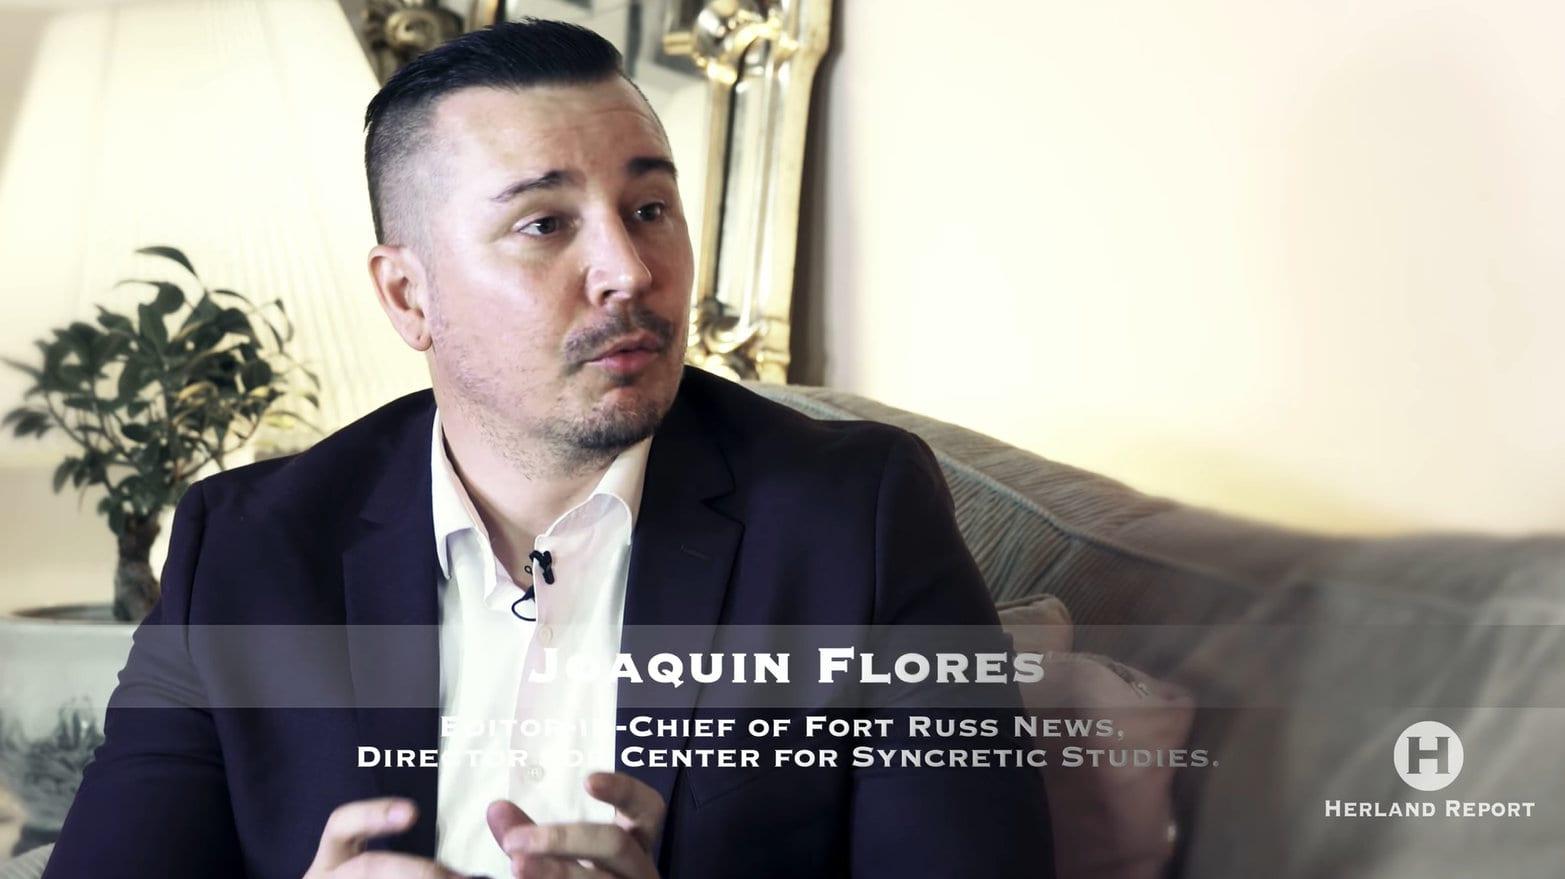 Joaquin Flores Fort Russ News Herland Report